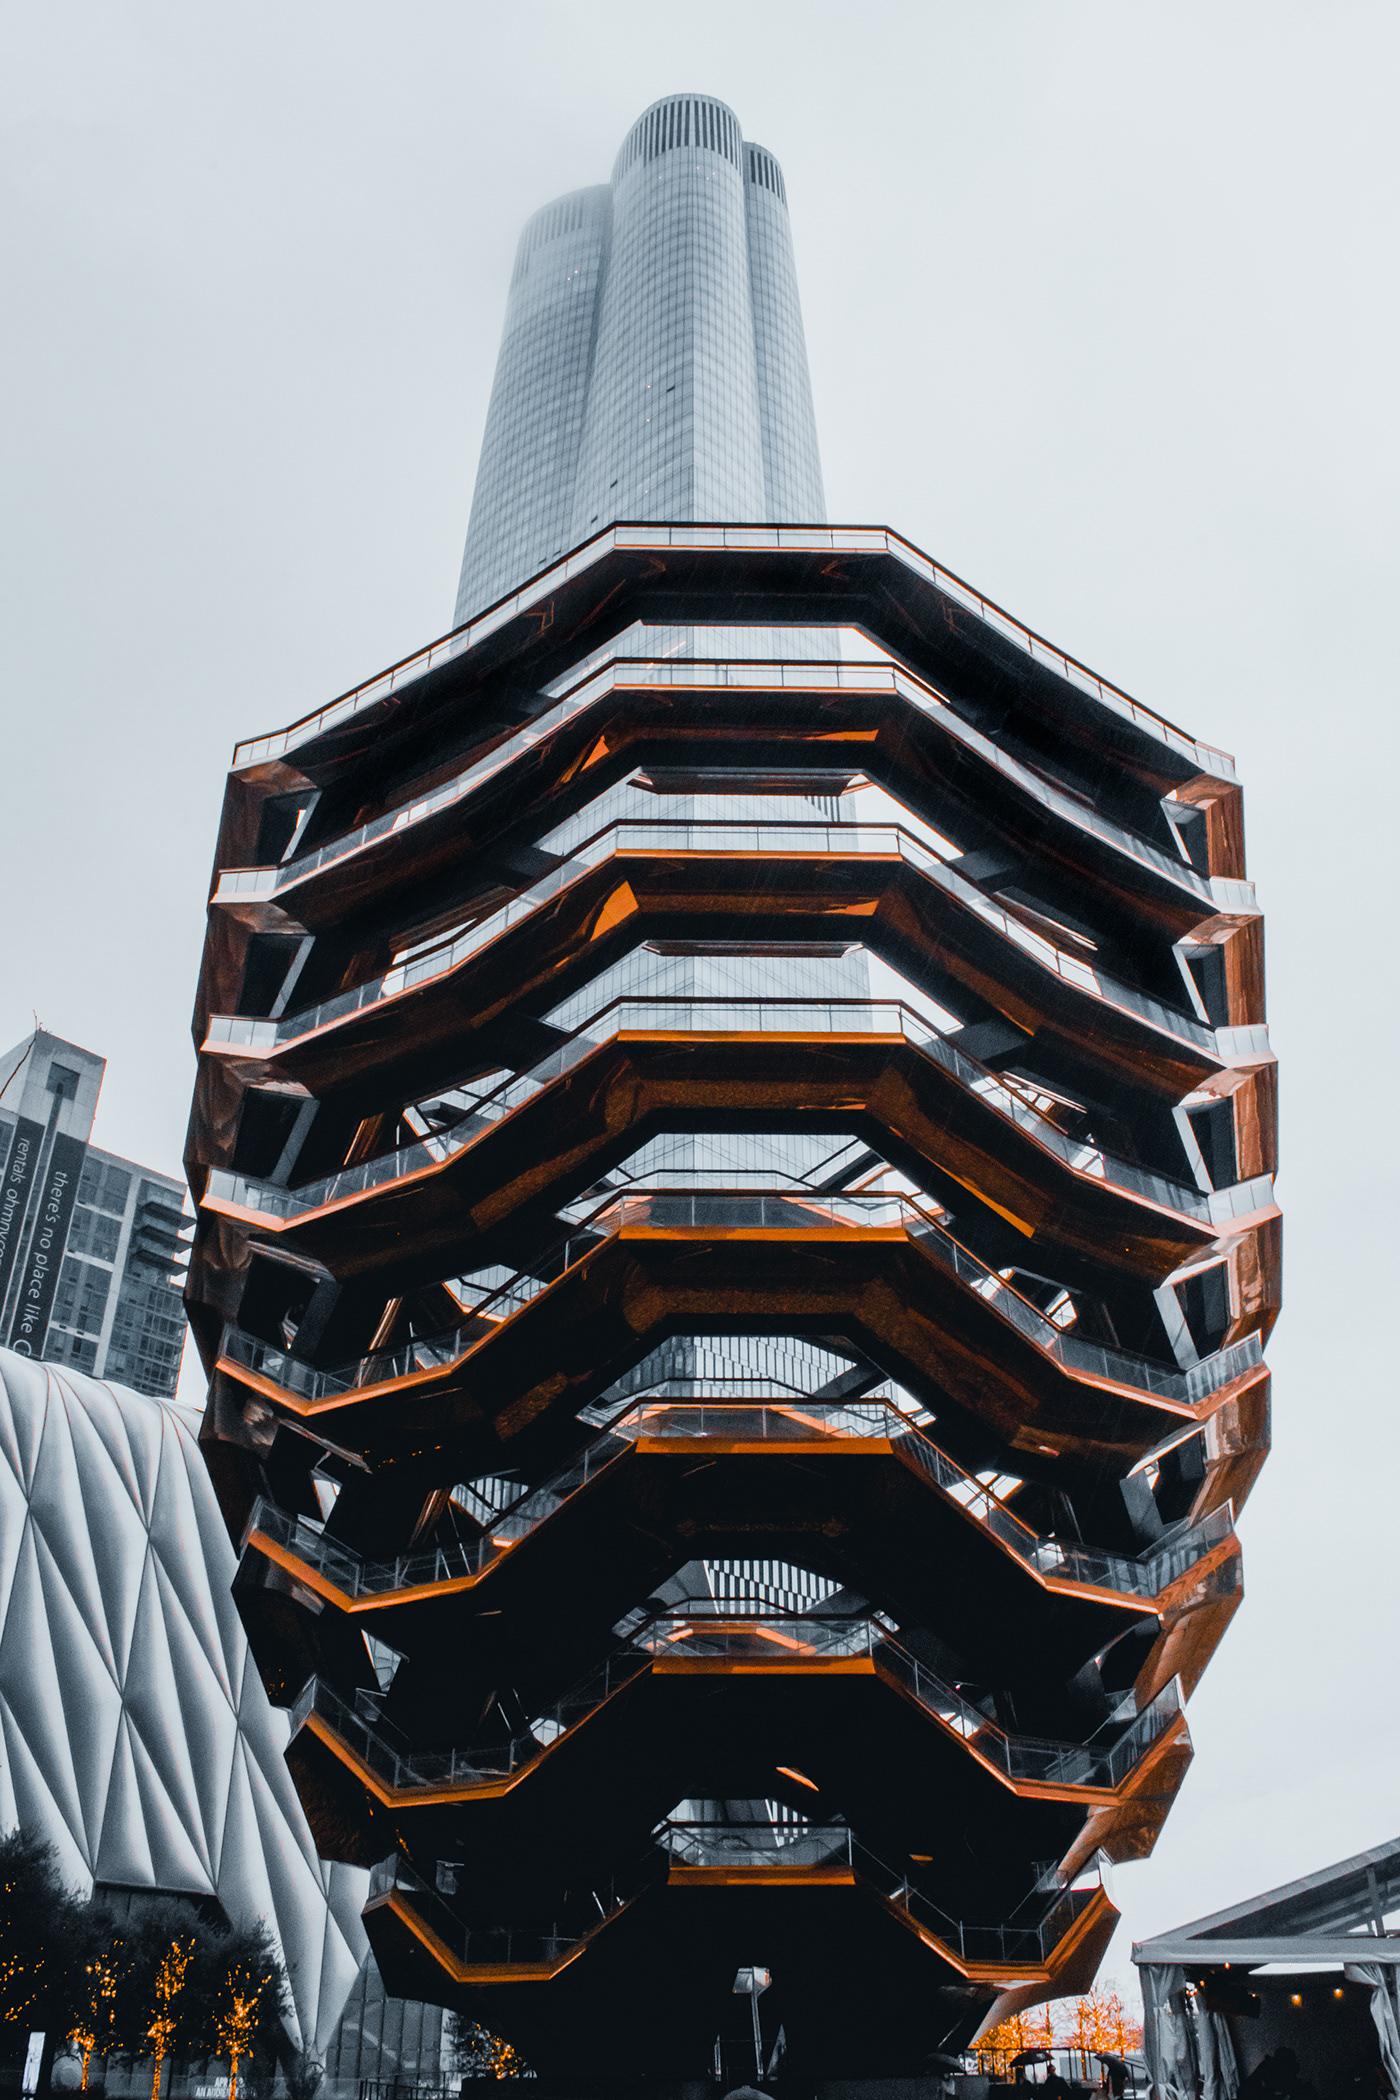 architecture Architecture Photography Hudson Yards Landmark Manhattan New York new york city nyc architecture The Vessel the vessel nyc